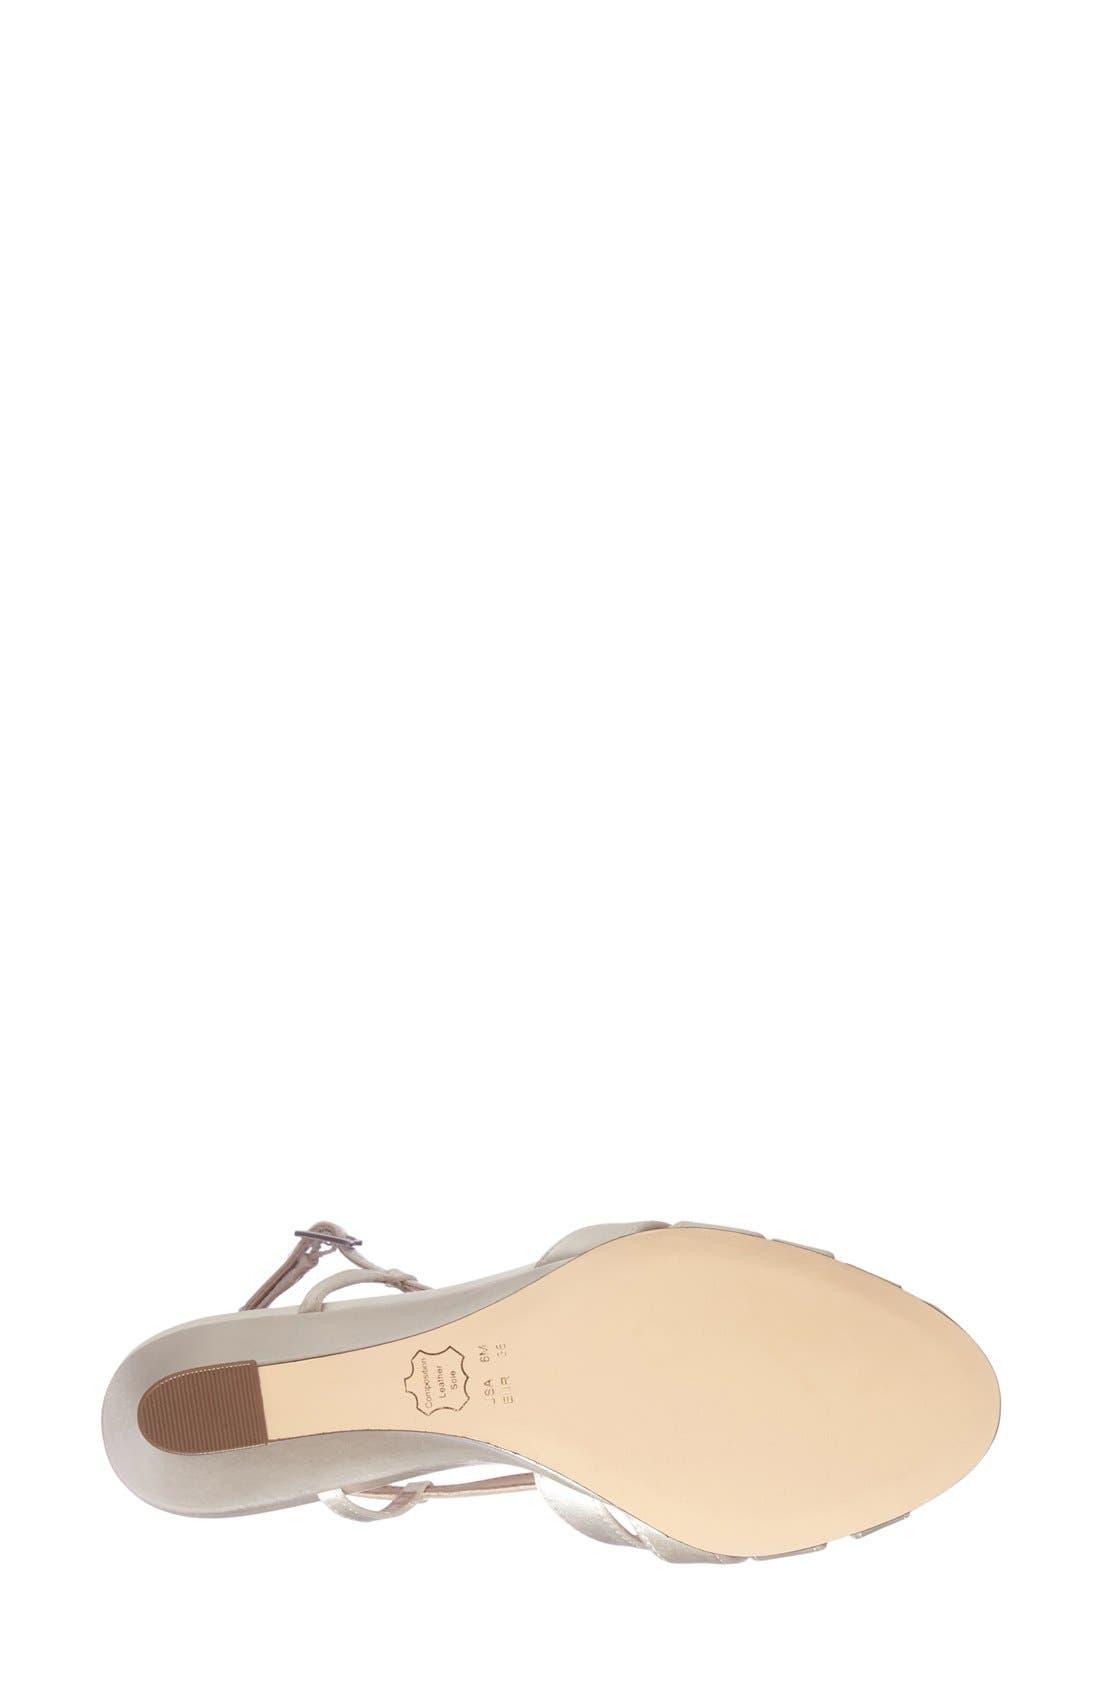 'Voleta' Wedge Sandal,                             Alternate thumbnail 4, color,                             900